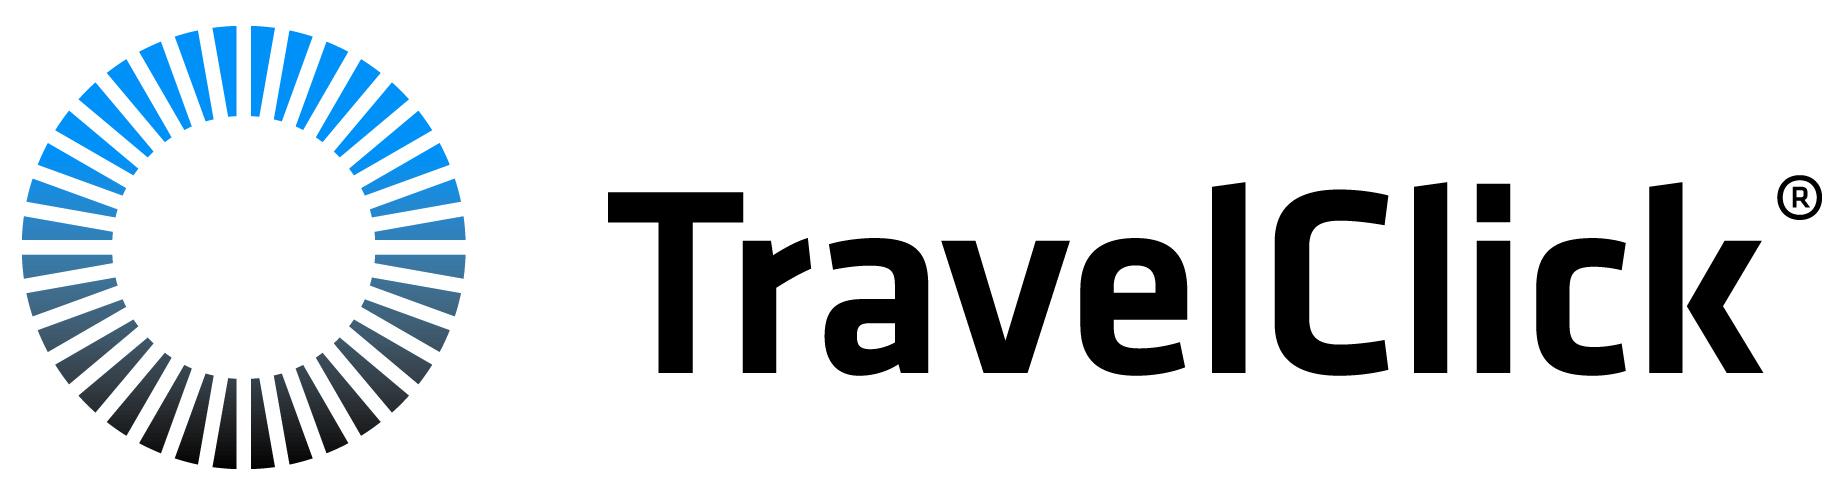 TravelClick Logo_R_high_res_JPG.jpg